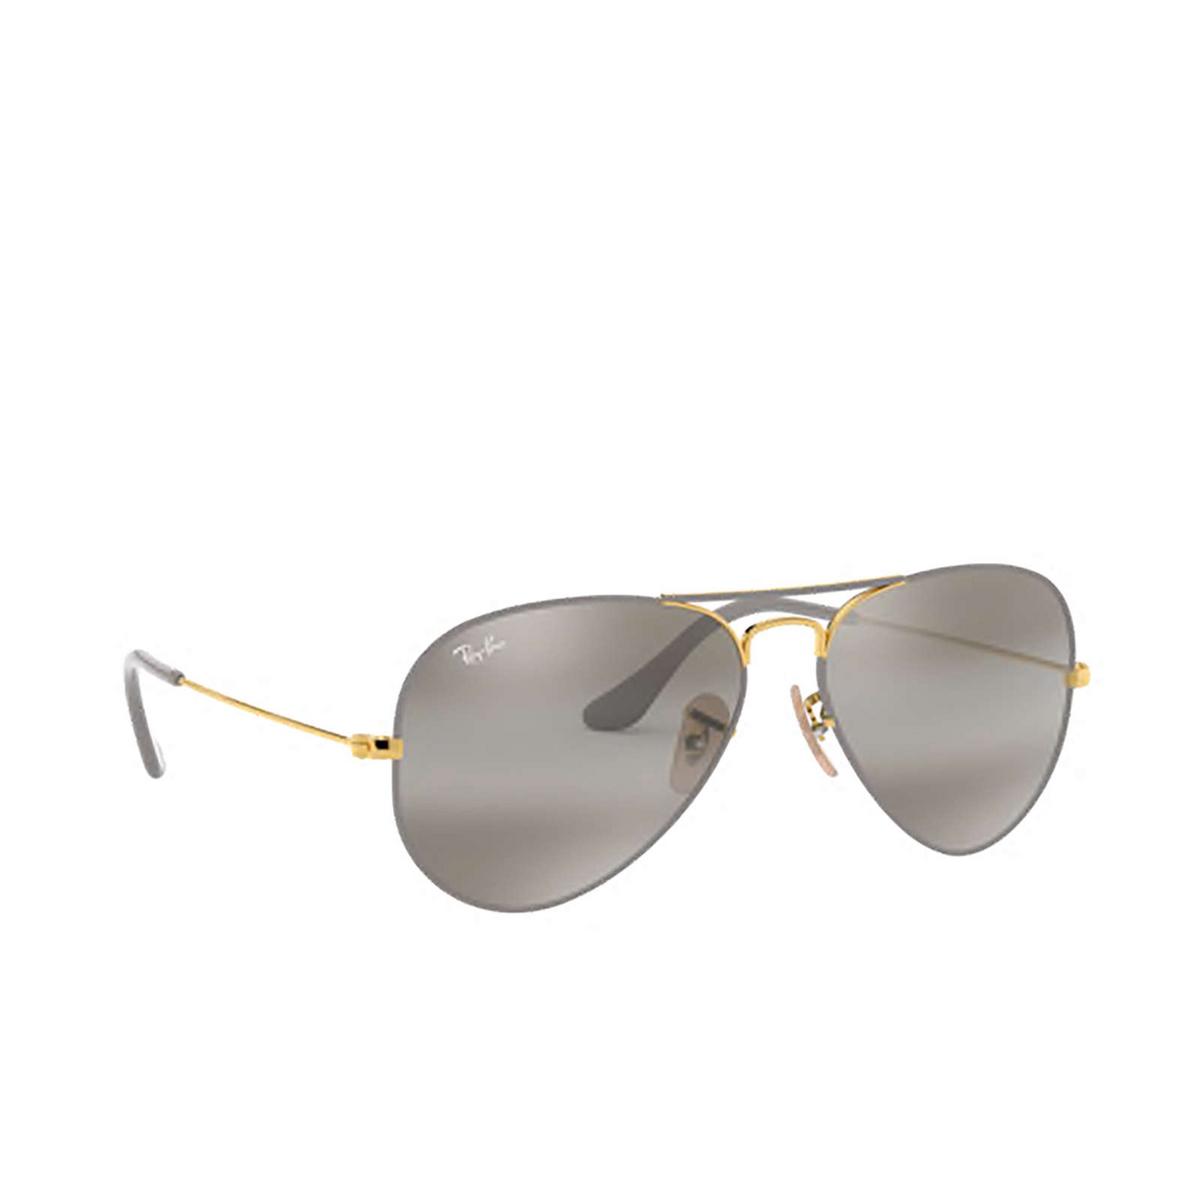 Ray-Ban® Aviator Sunglasses: Aviator Large Metal RB3025 color Matte Grey On Arista 9154AH.